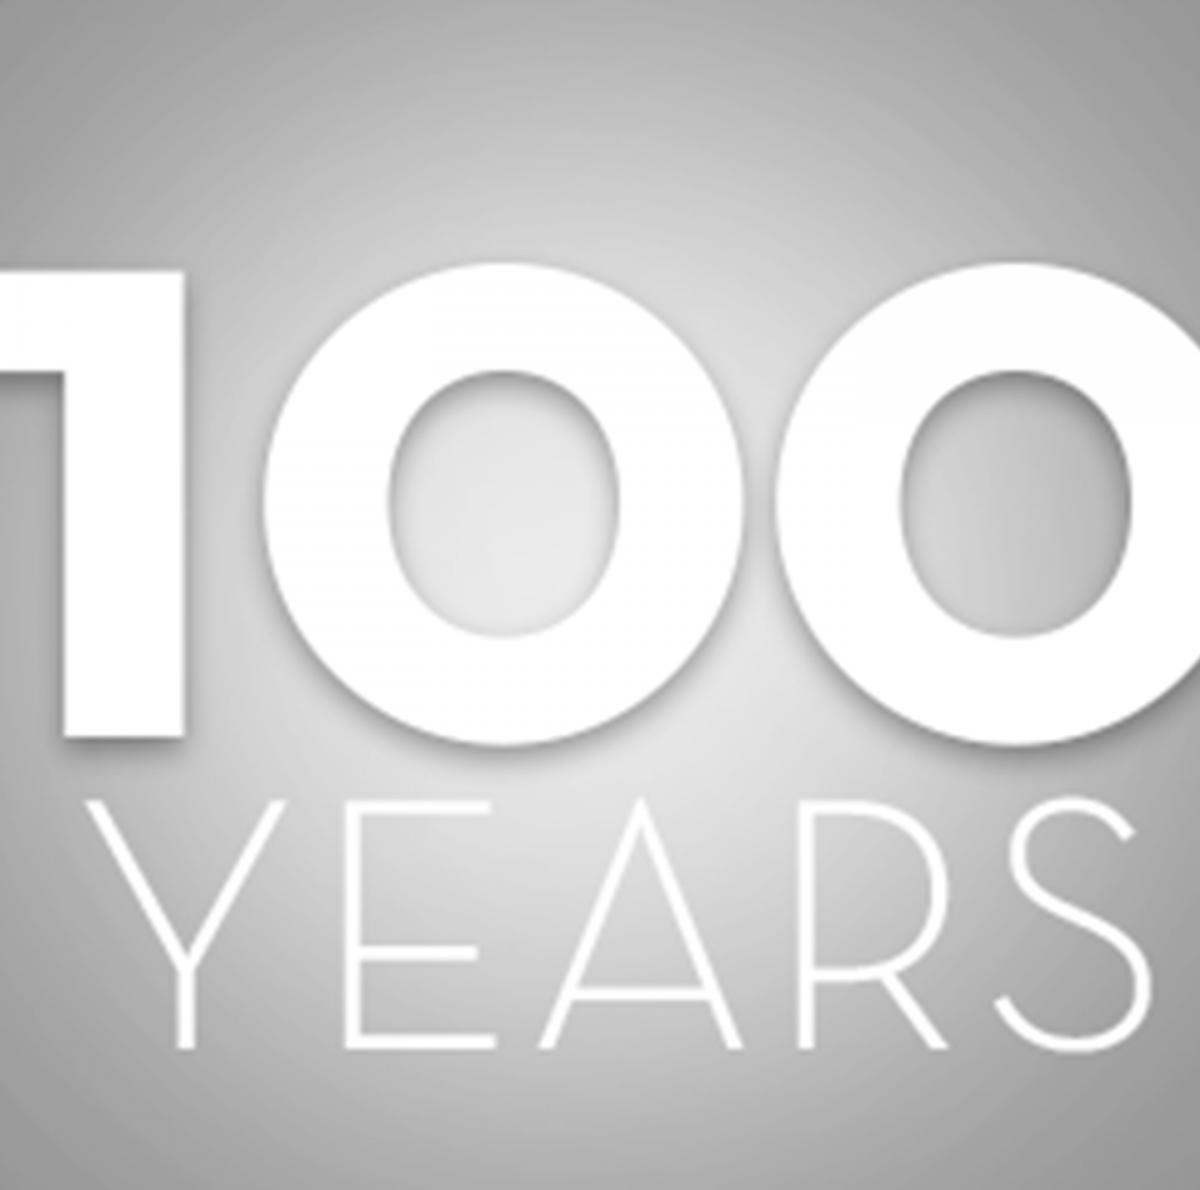 Morinaga 100 Years